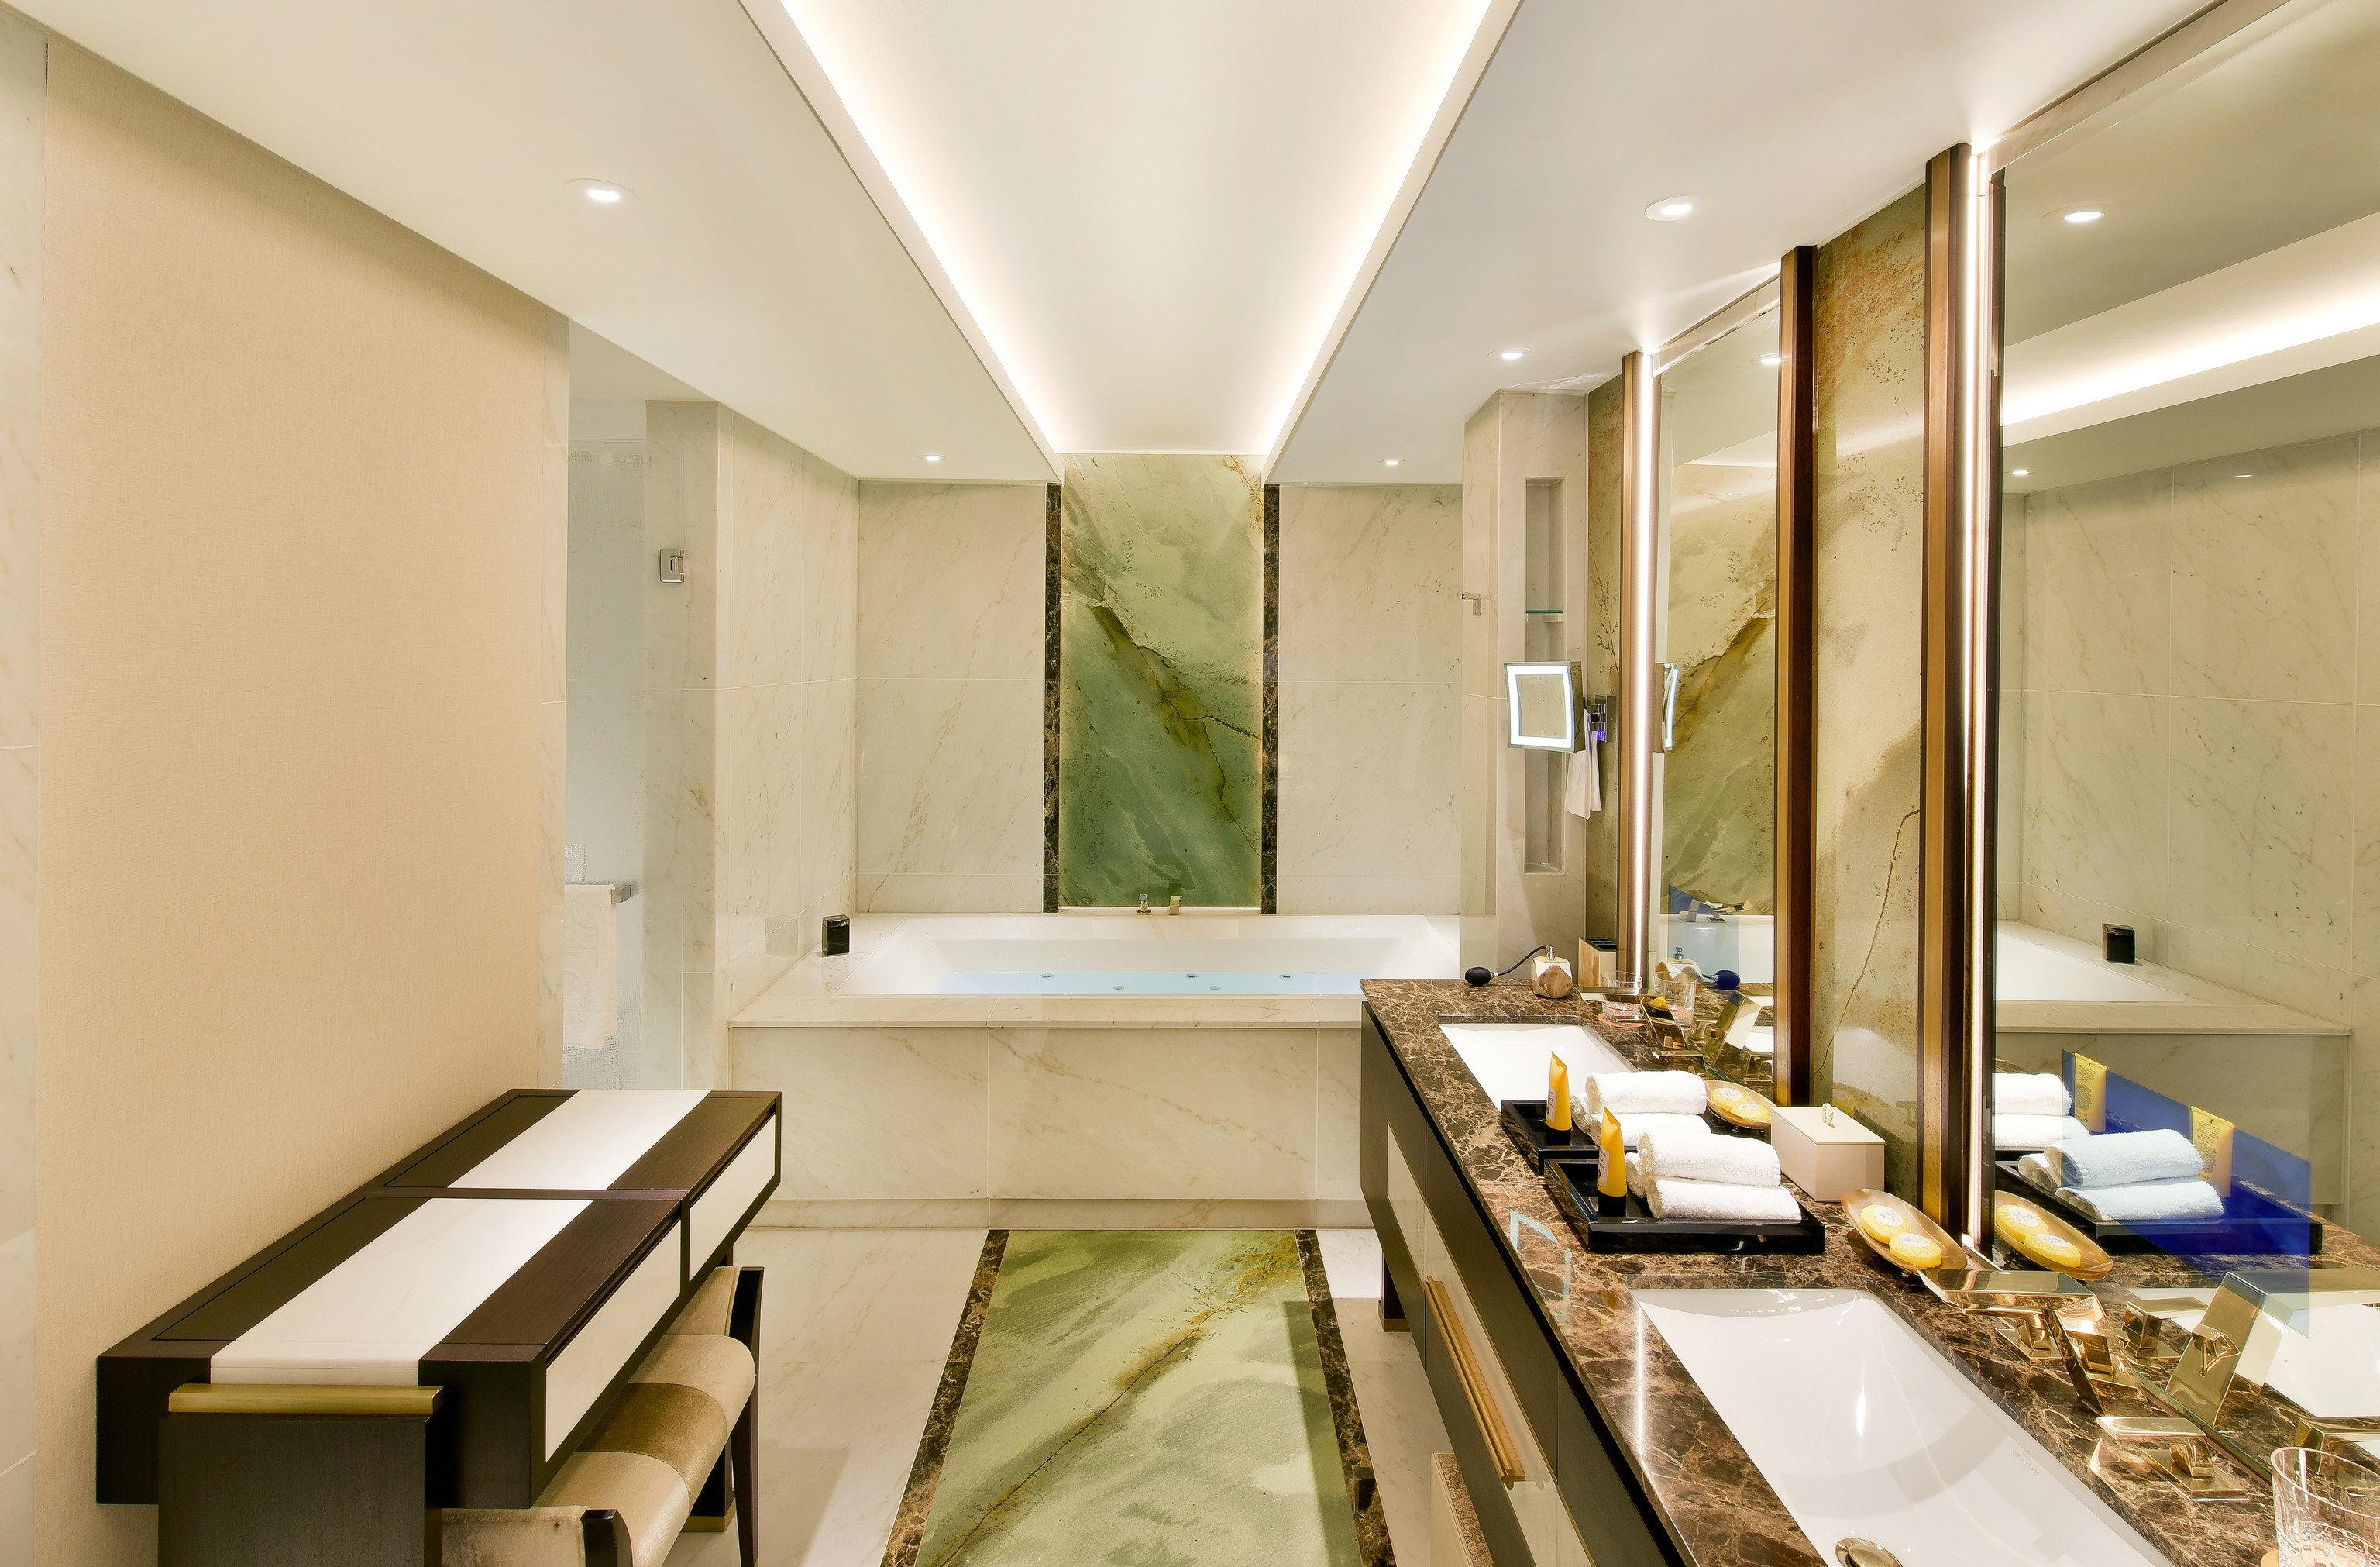 Hotels Luxury Travel indoor wall bathroom ceiling interior design counter sink Lobby interior designer daylighting